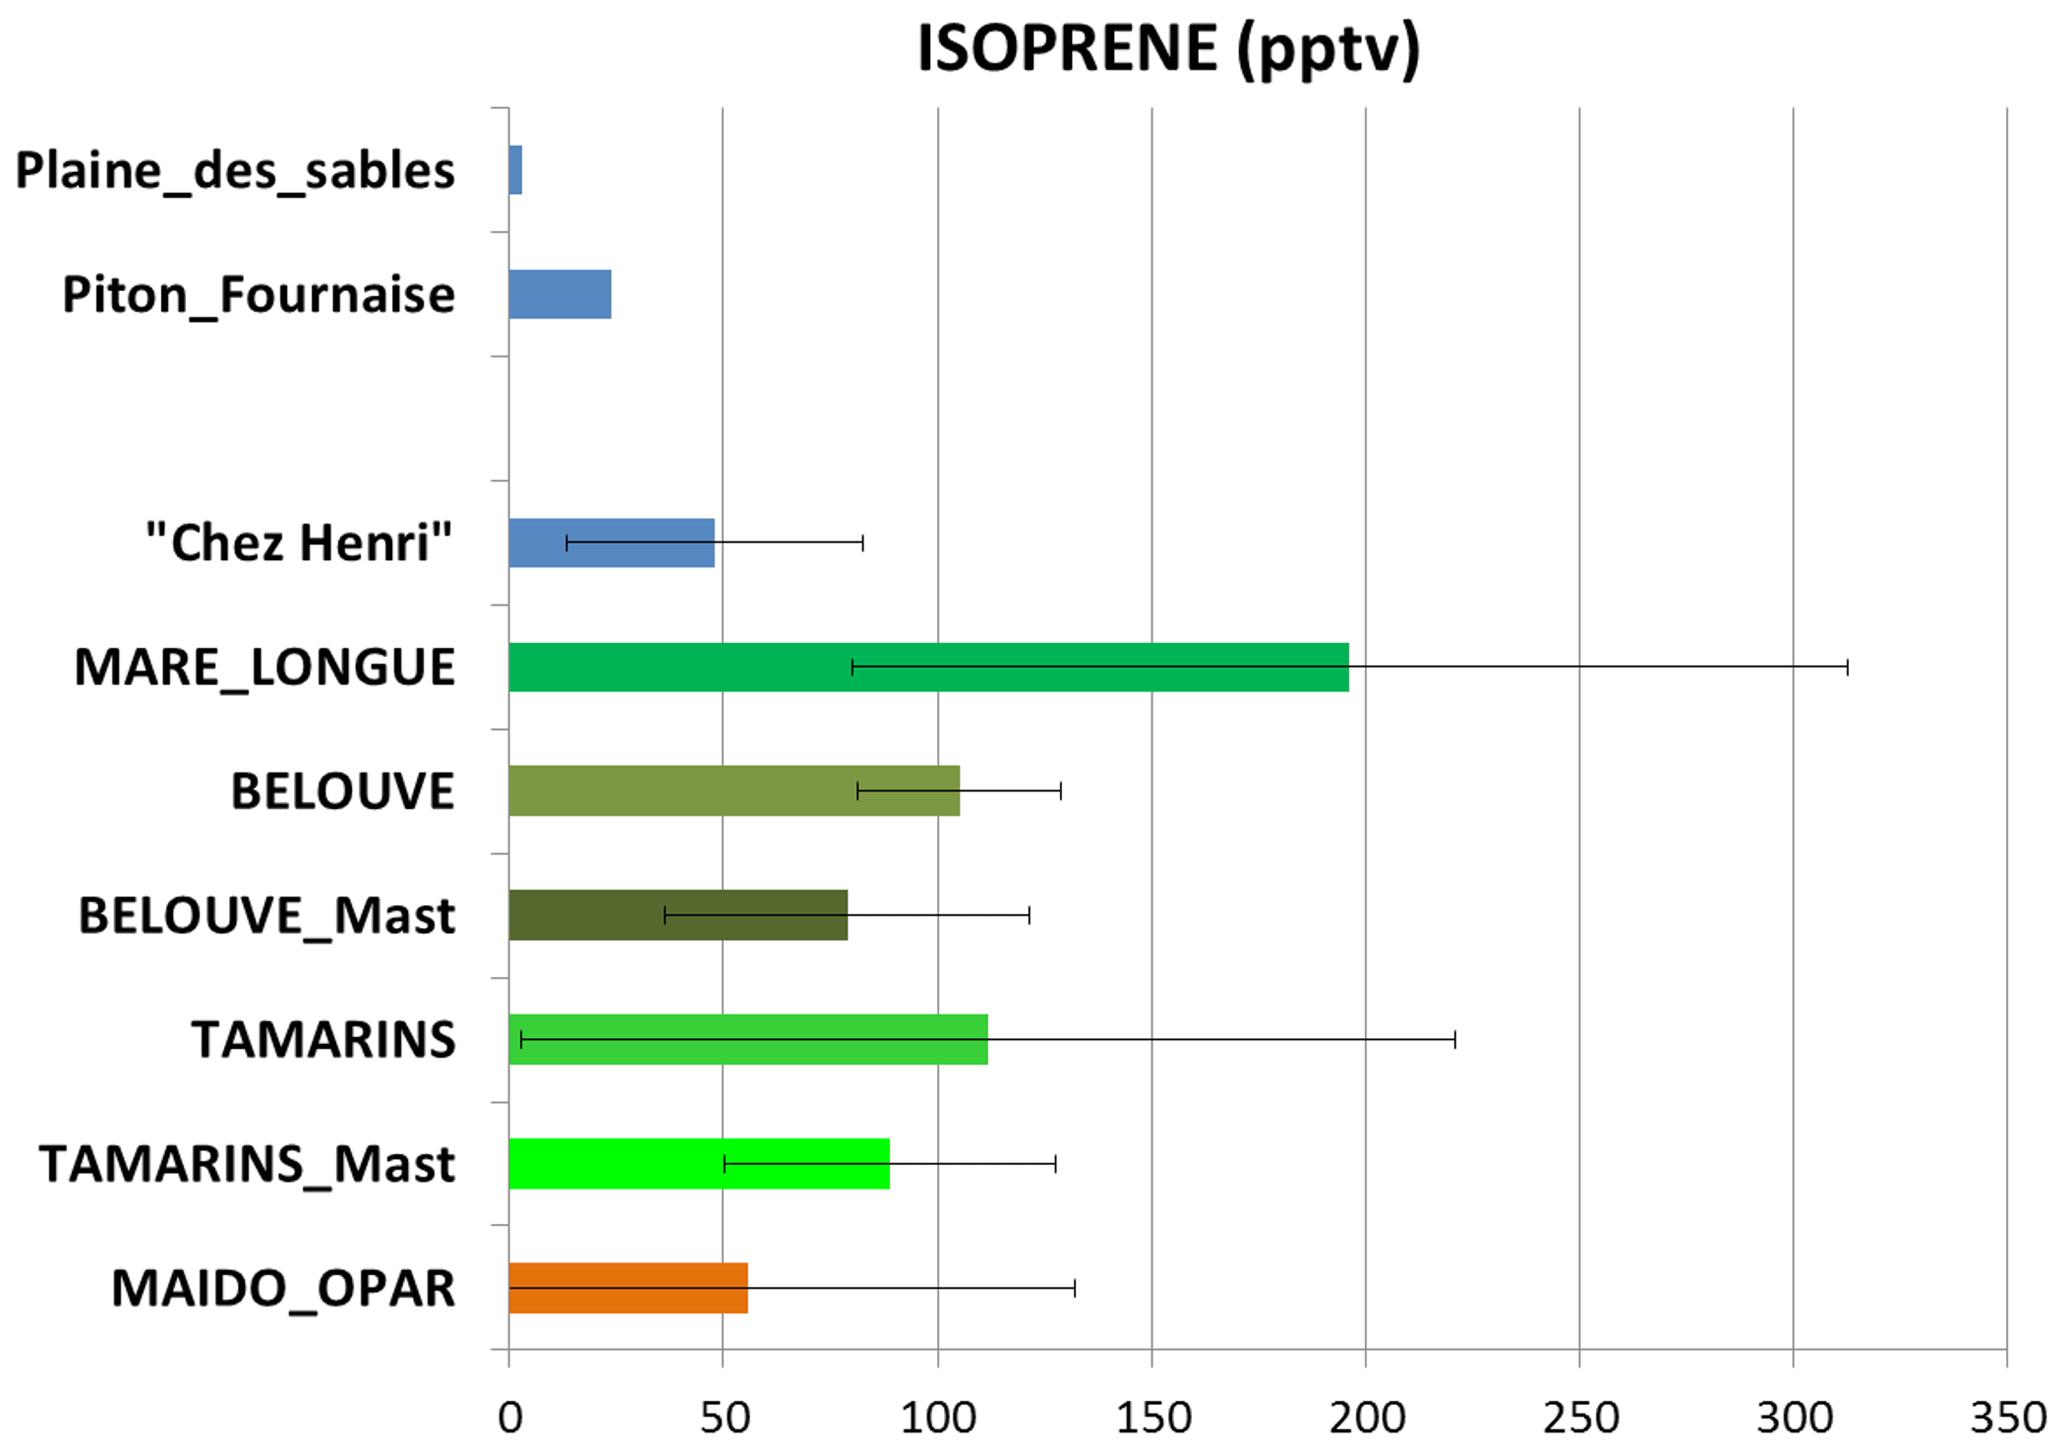 ACP - Preliminary results from the FARCE 2015 campaign